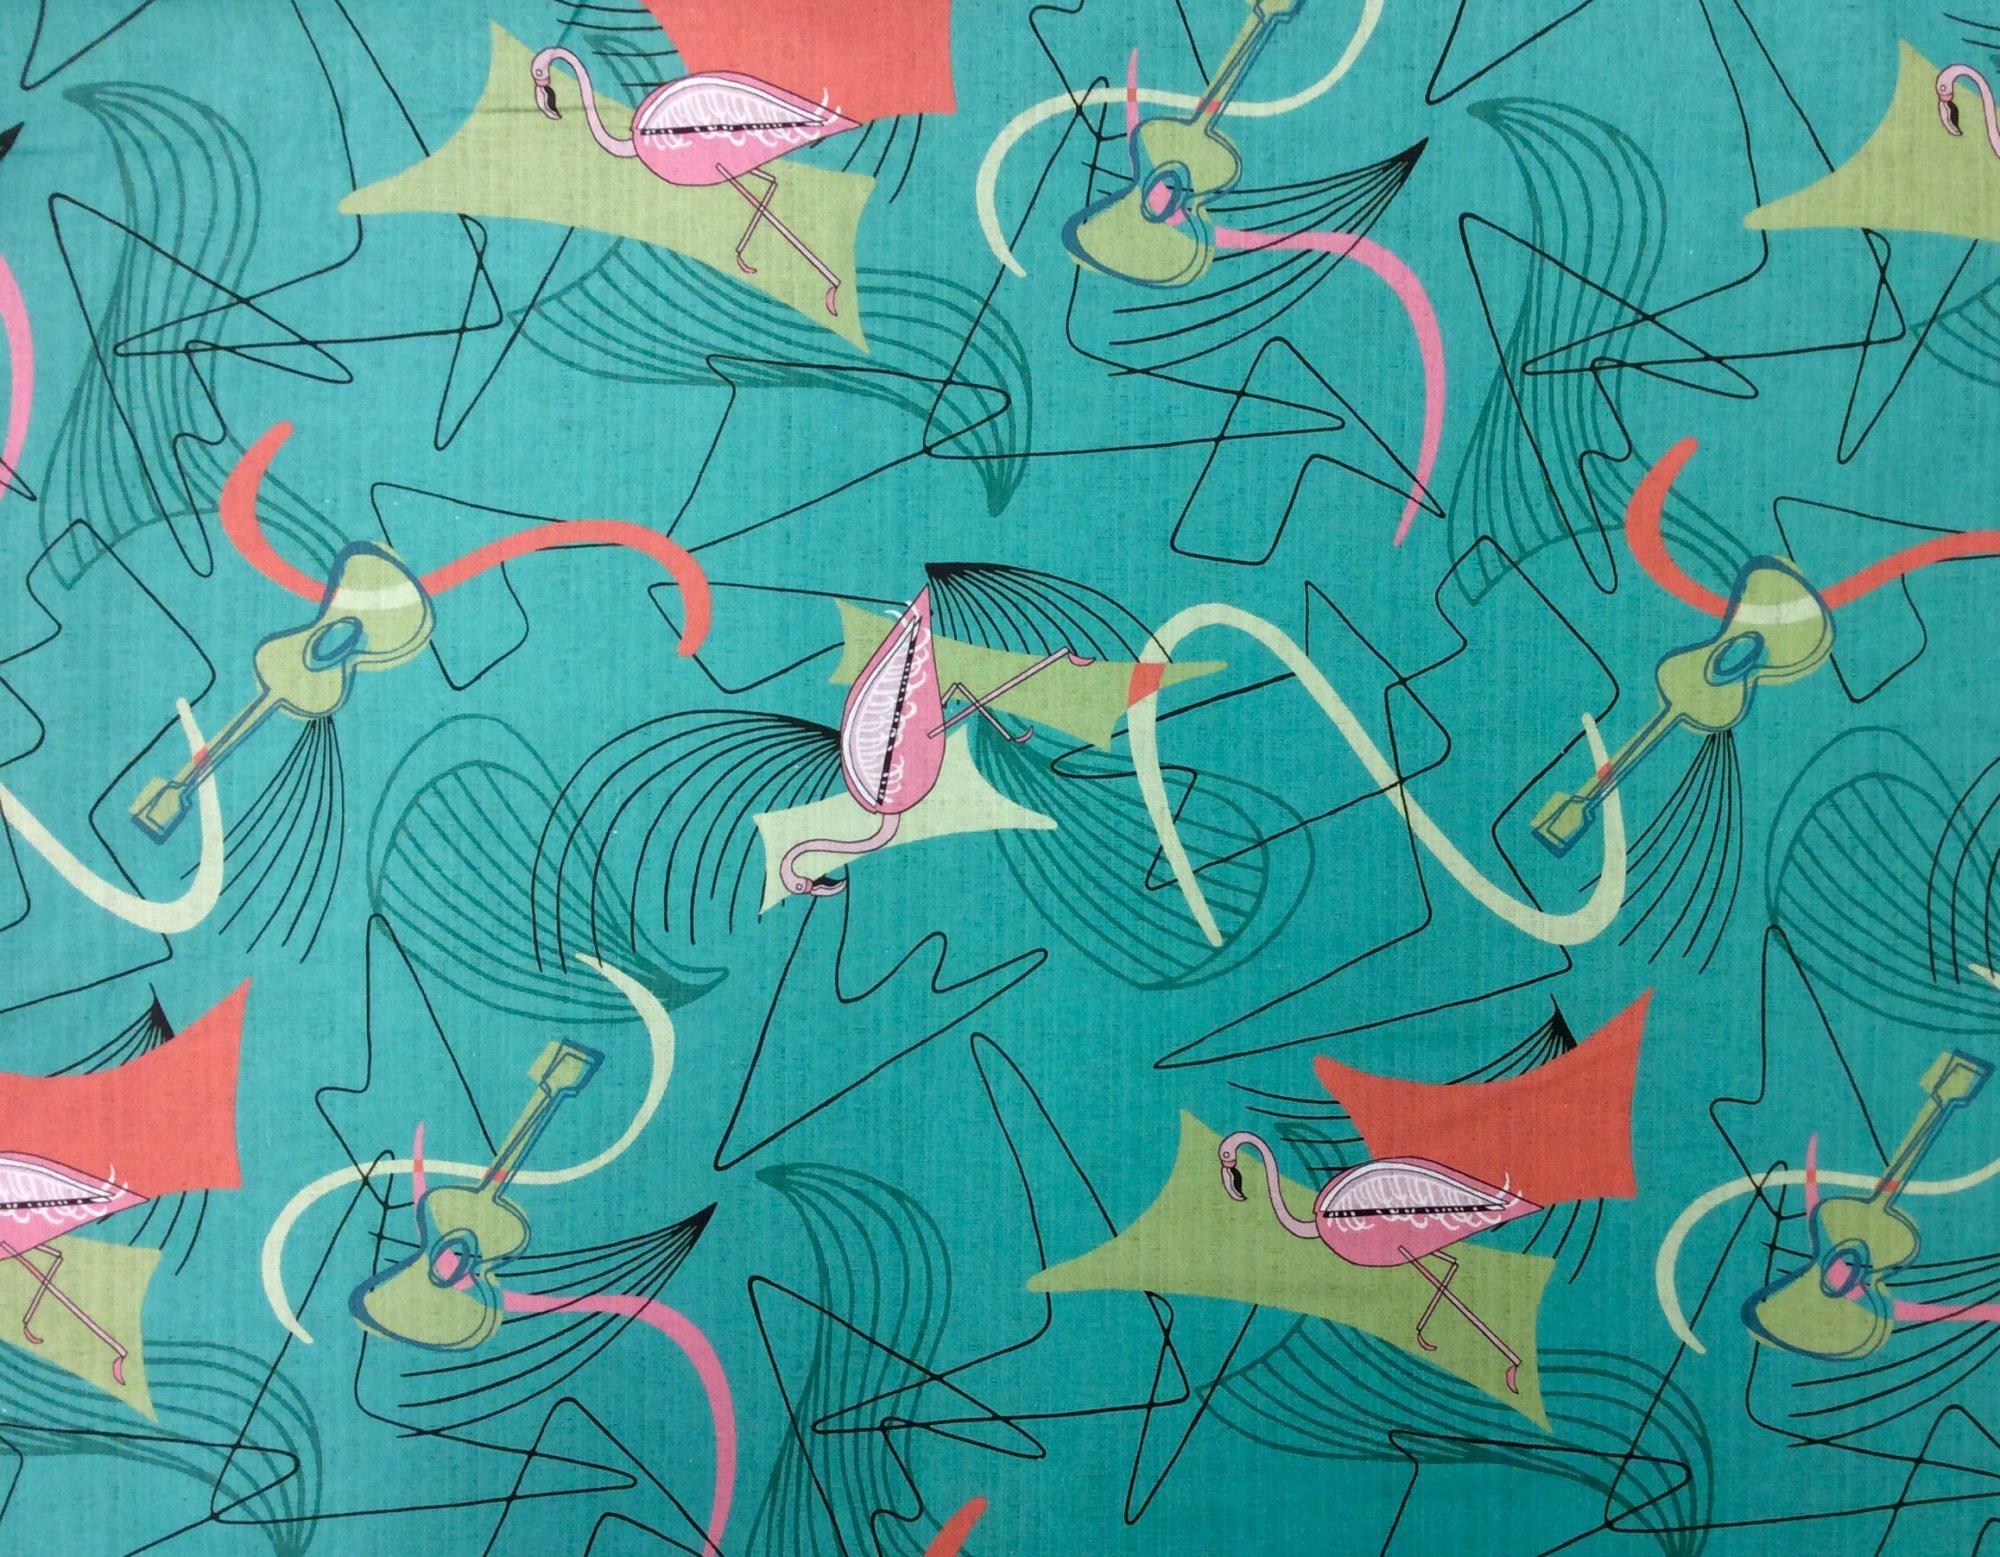 Atomic Retro Mid Century Modern Flamingo Guitar Boomerang Sputnik Space Age MCM Cotton Fabric Light Weight Canvas HM25